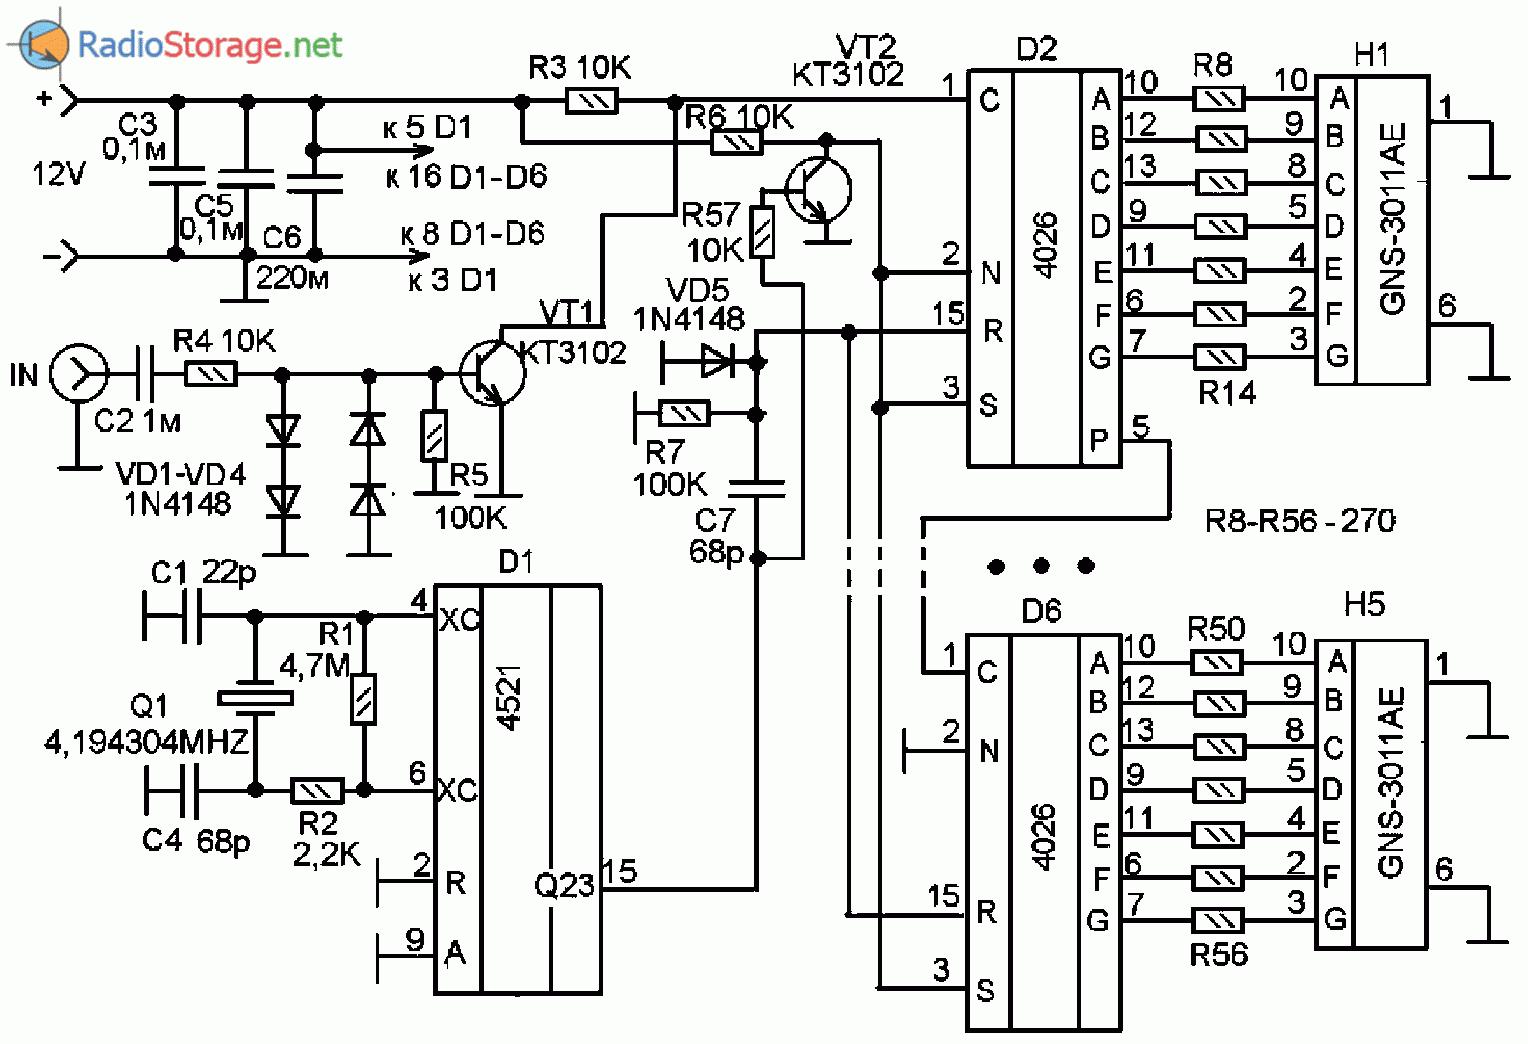 Осциллограф из монитора схема 2